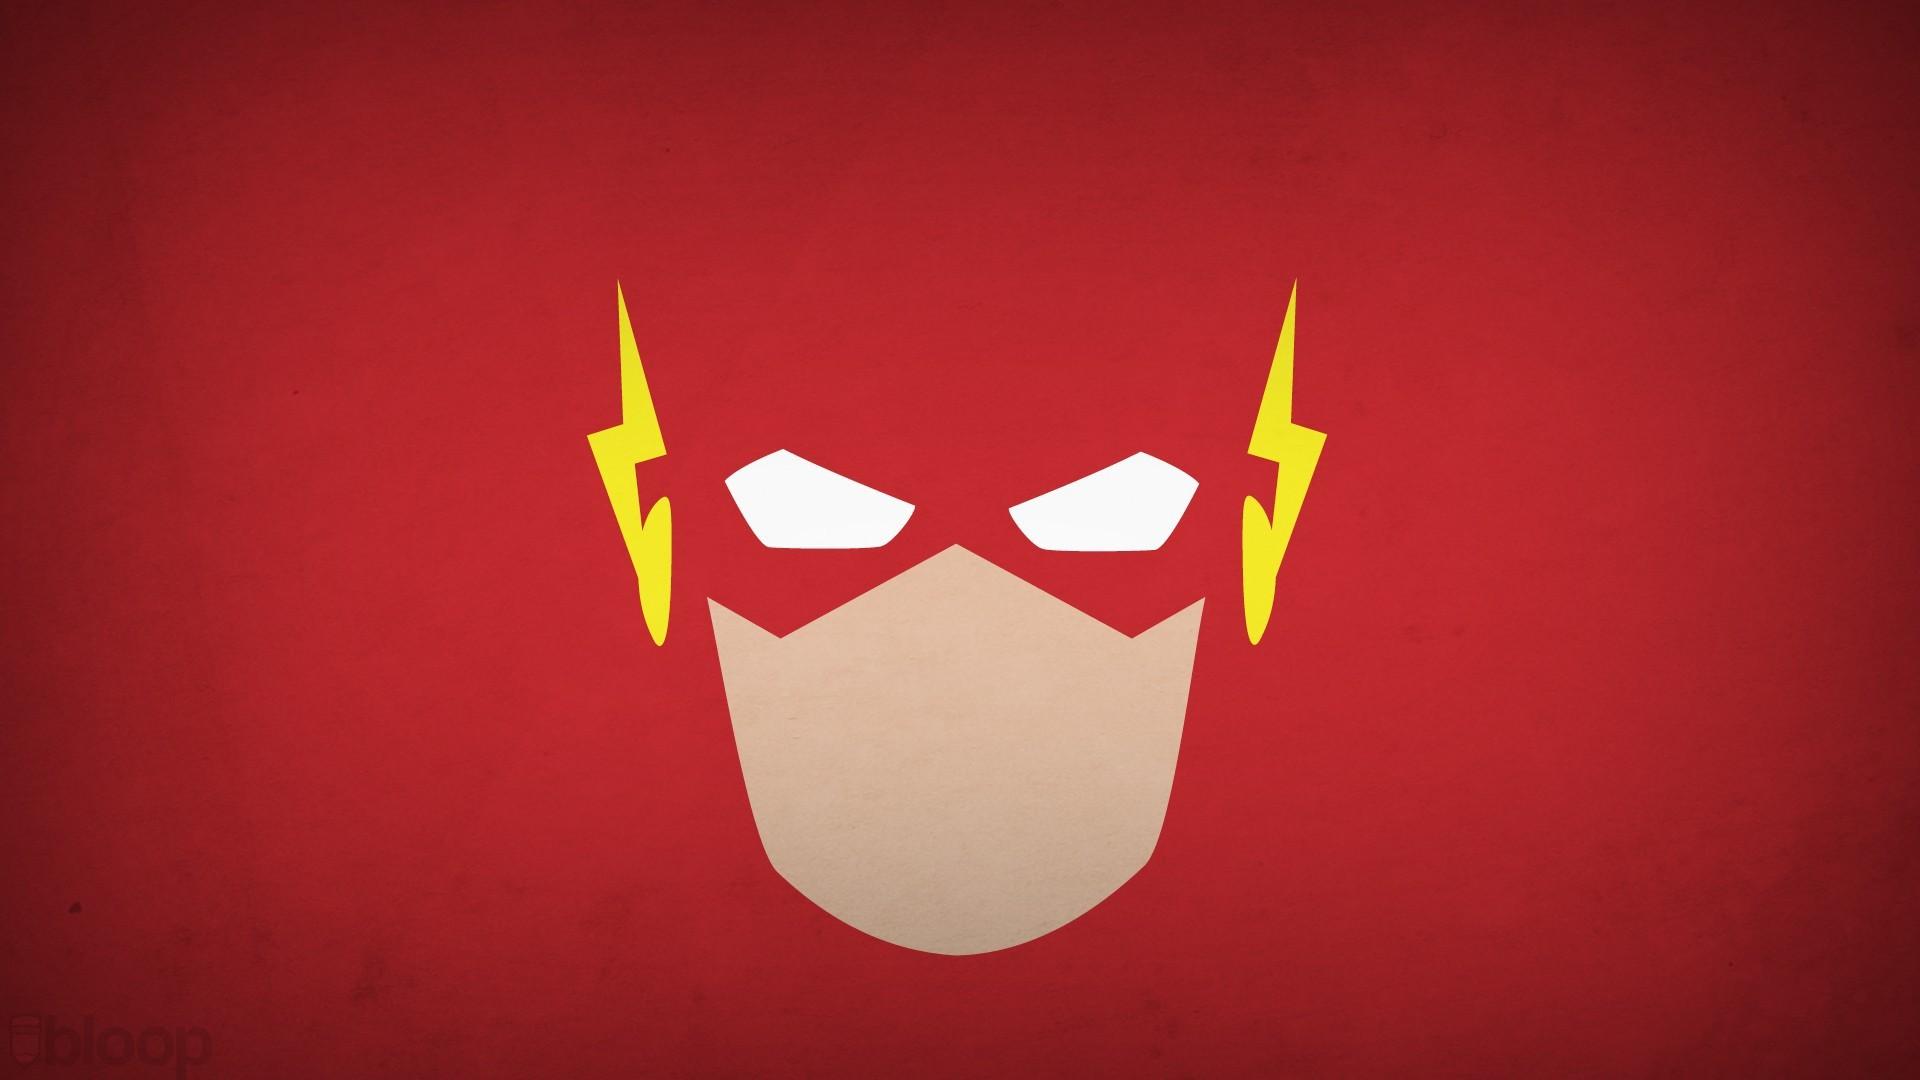 Blo0p The Flash